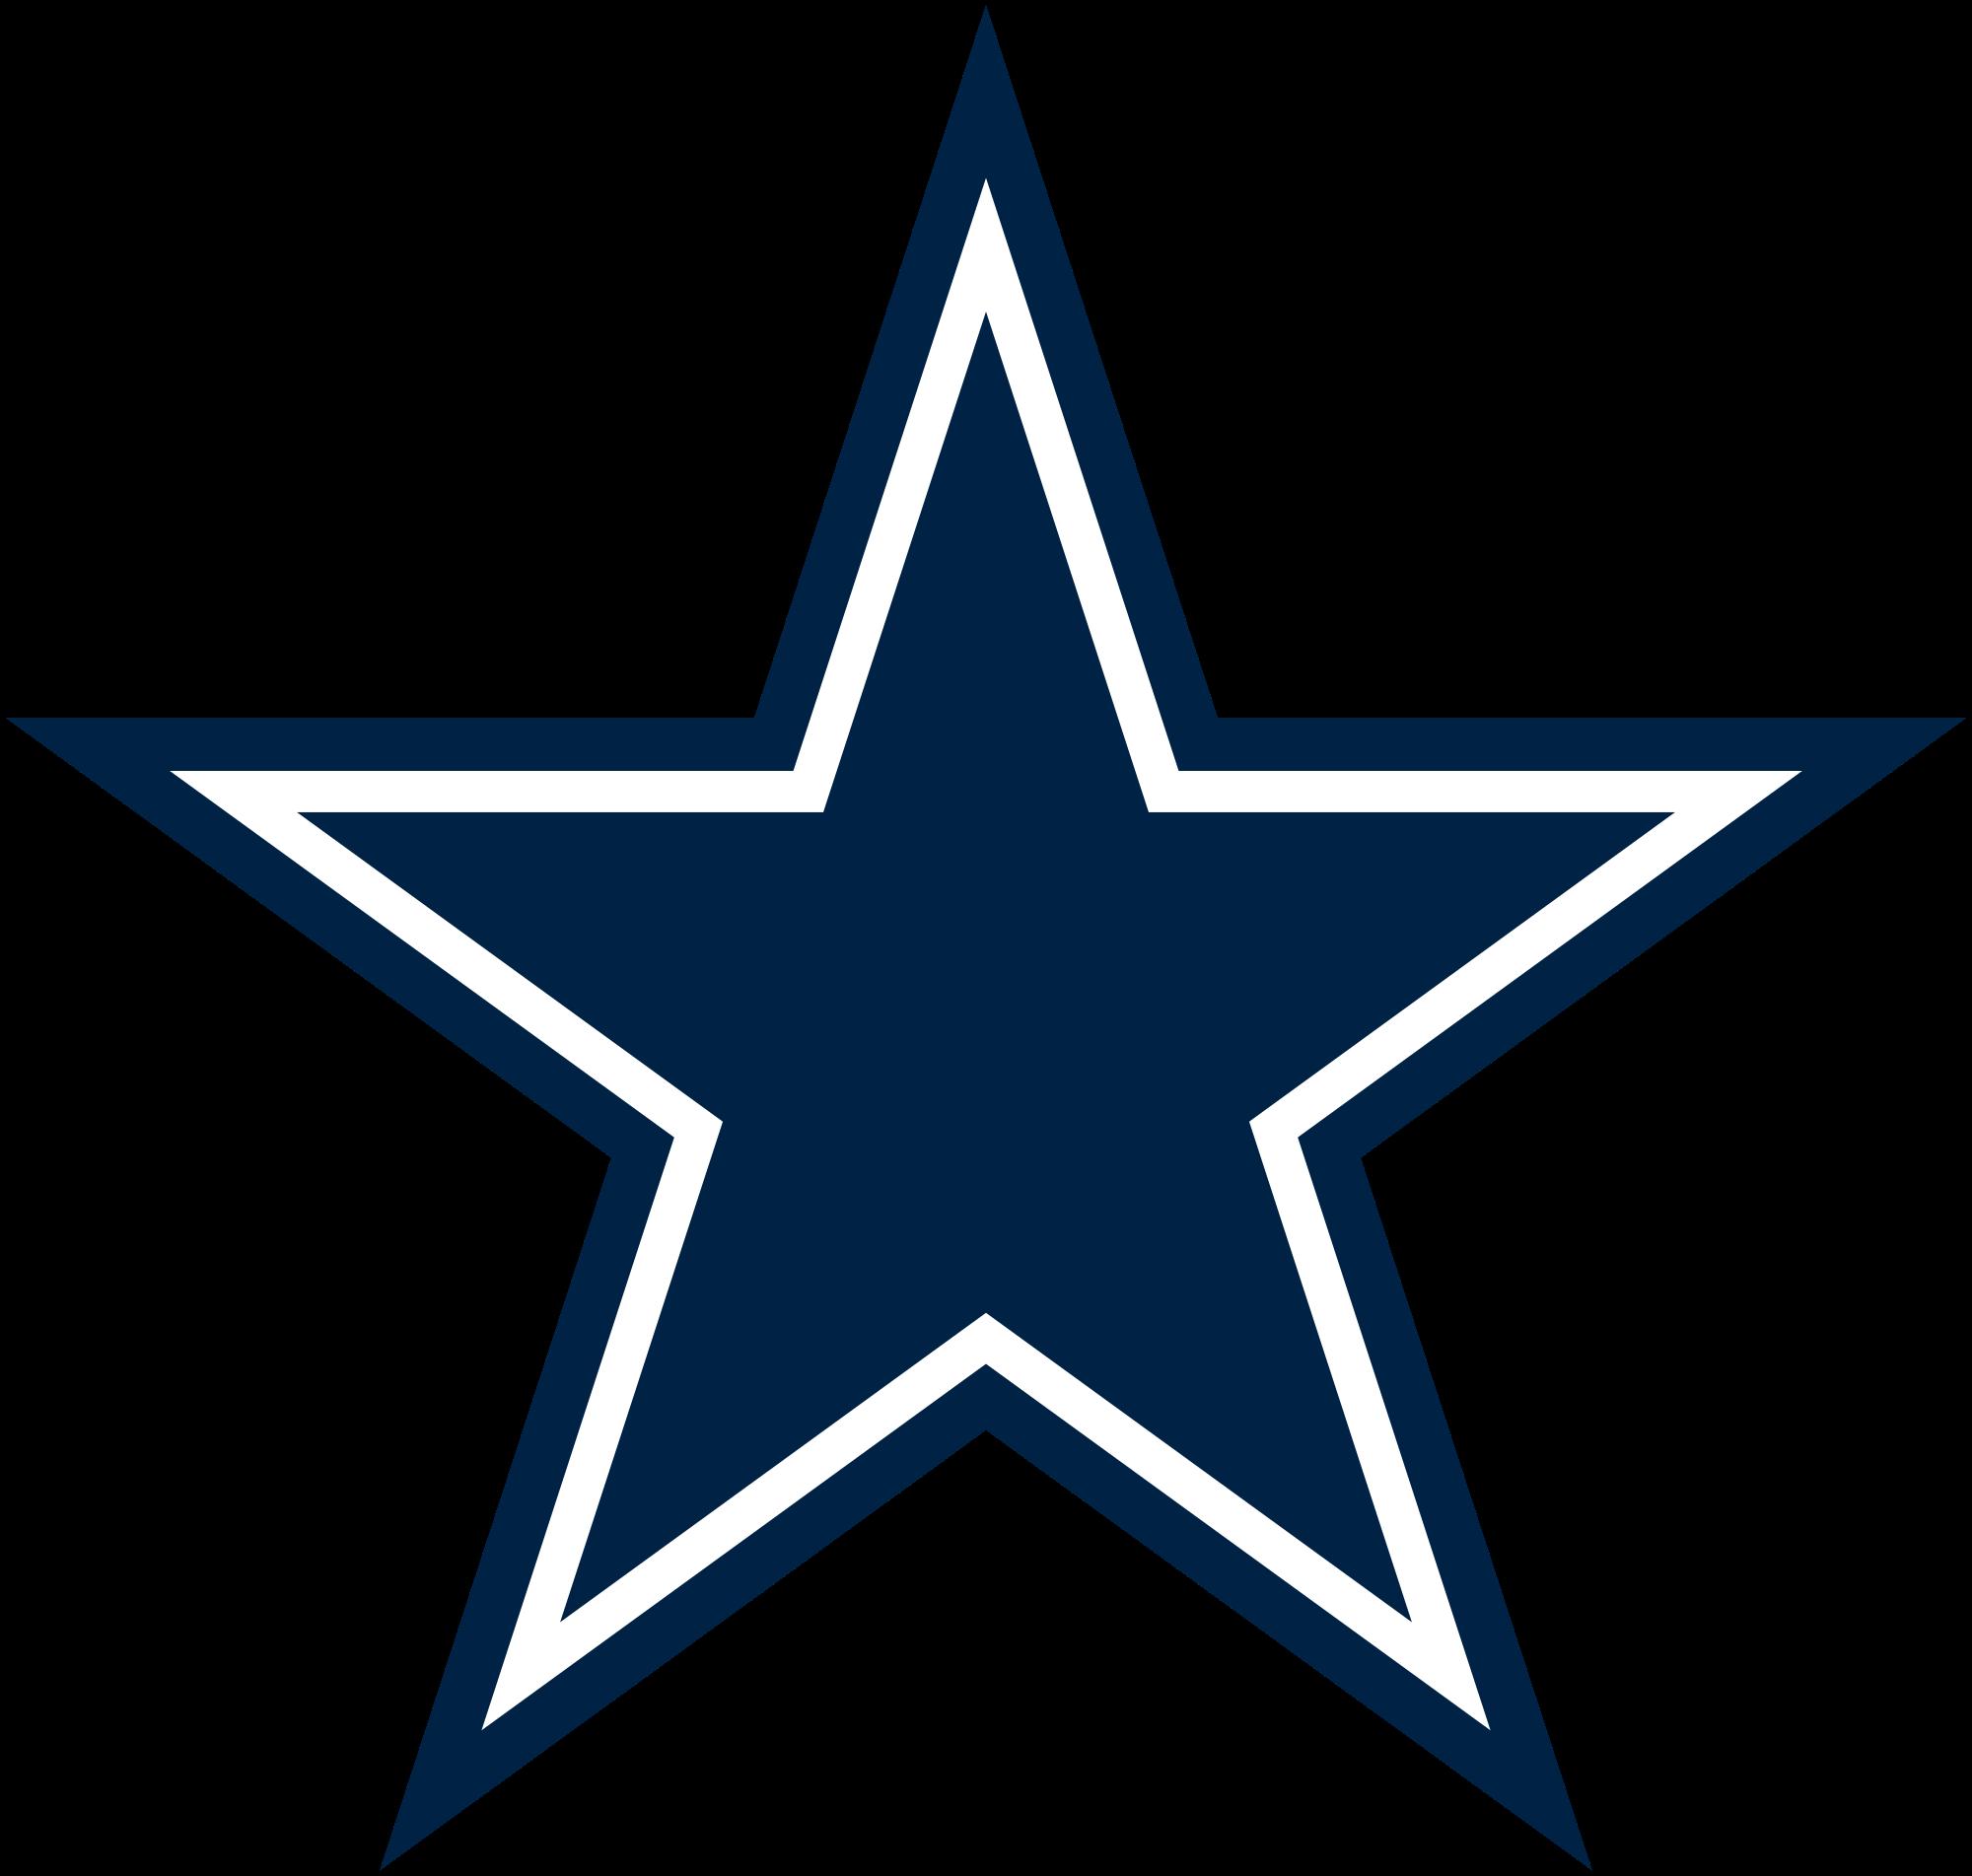 Dallas cowboy football clipart image library download Dallas Cowboys PNG Transparent Dallas Cowboys.PNG Images. | PlusPNG image library download